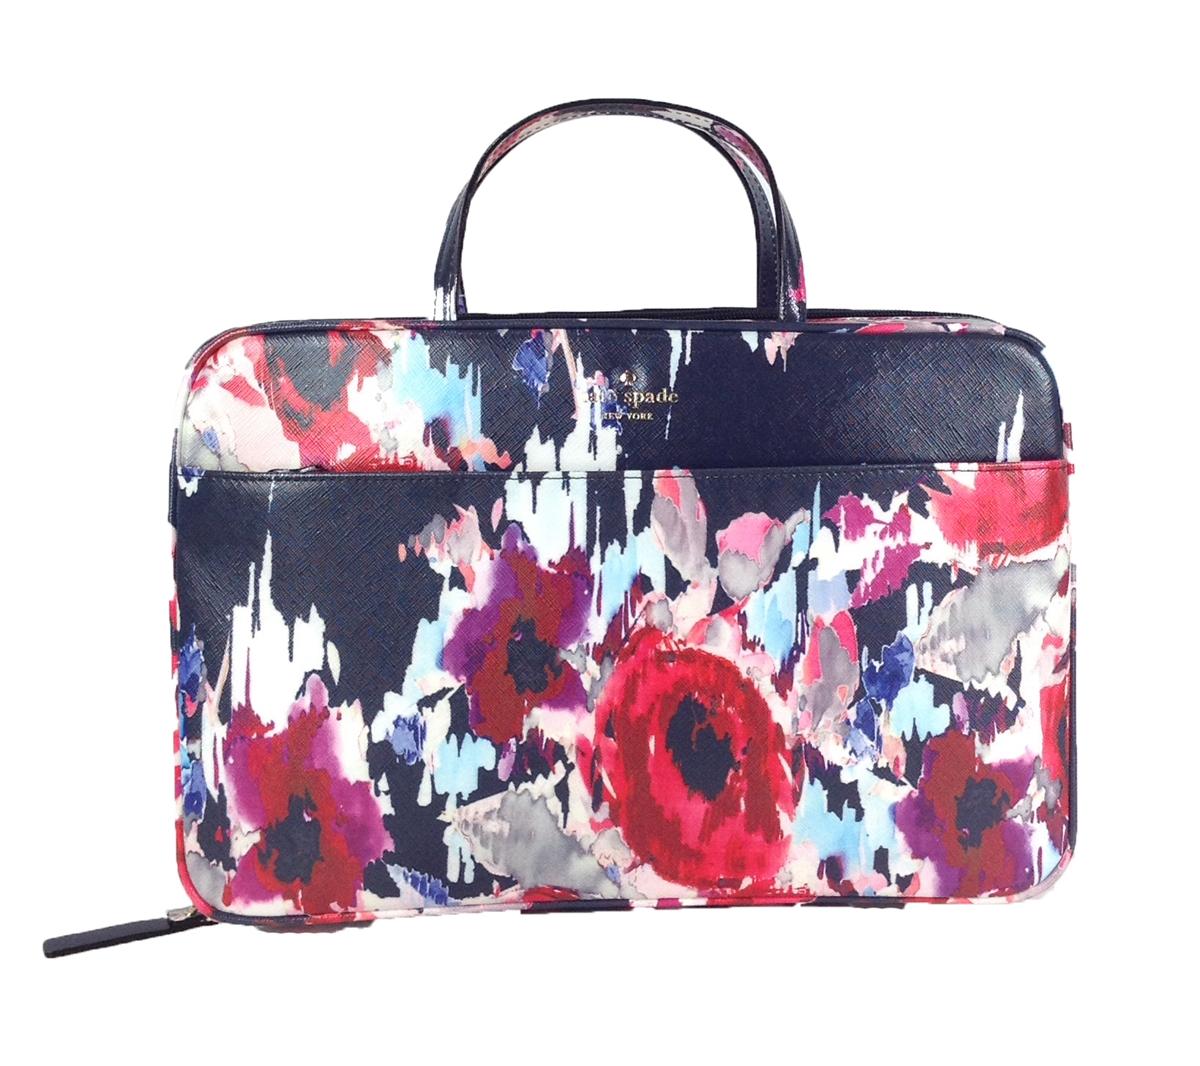 size 40 c7087 60f16 Kate Spade Cedar Street Large Manuela Travel Cosmetic Case, Hazy Floral